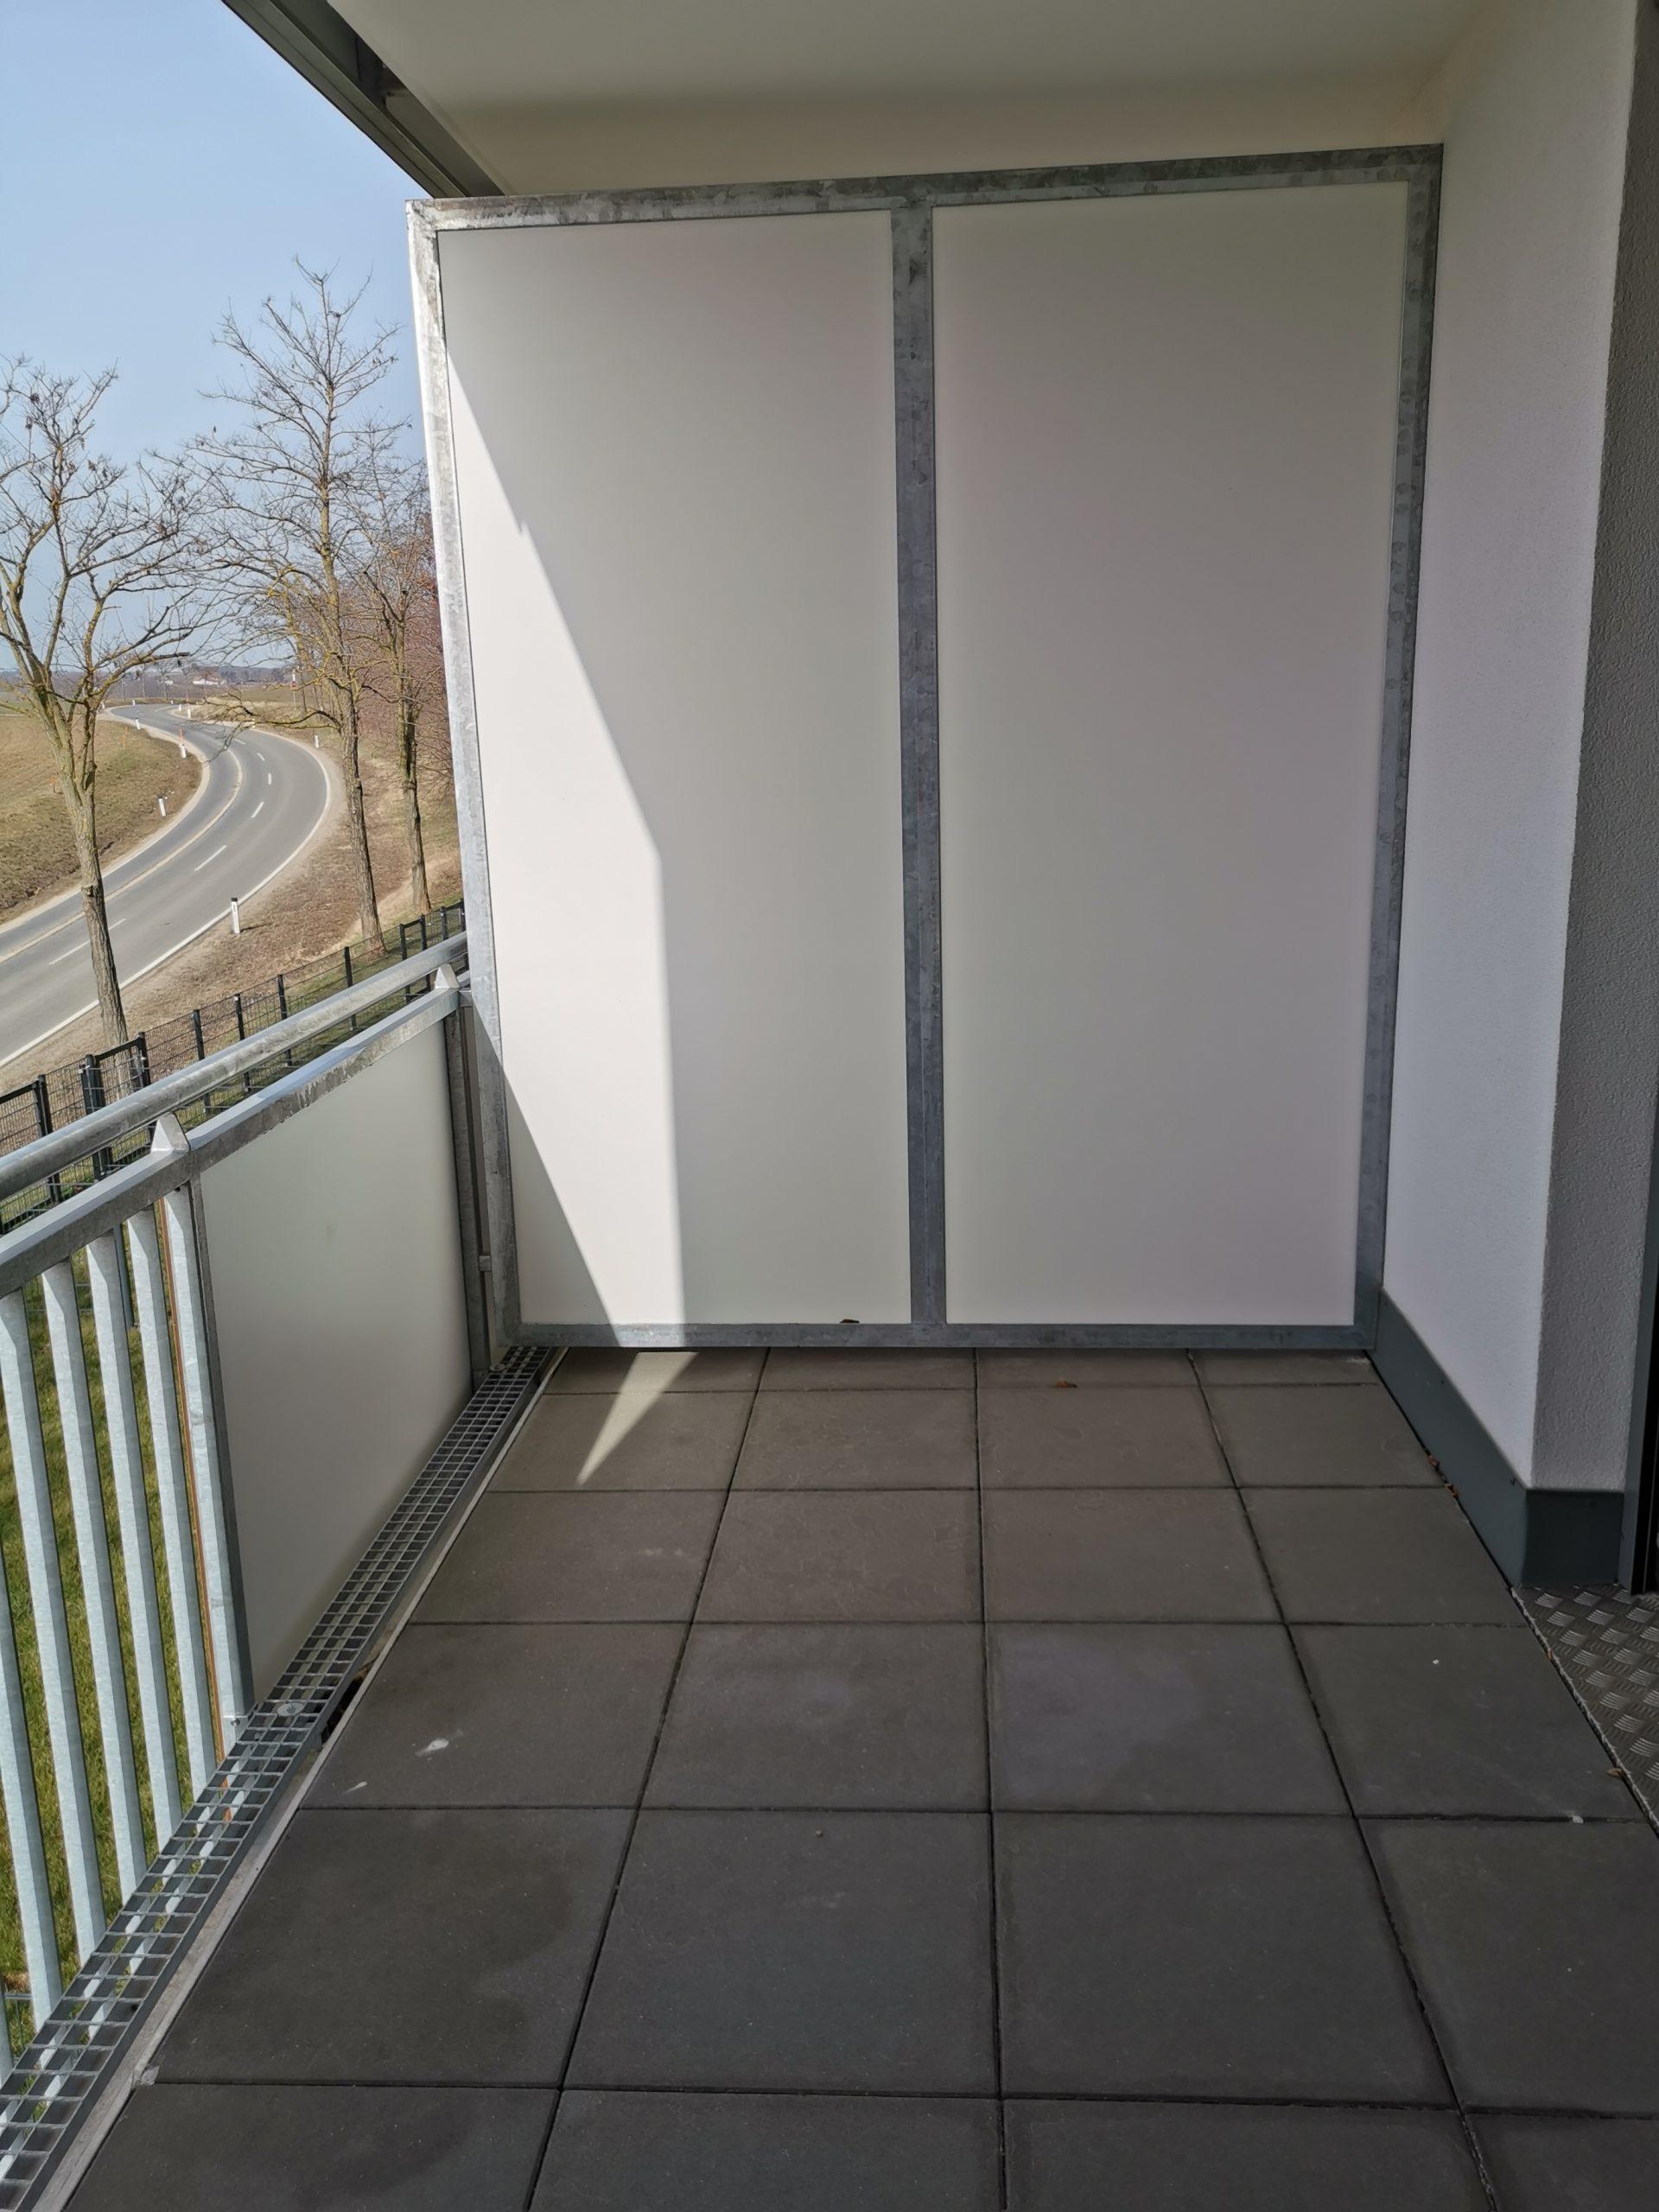 Immobilie von Kamptal in 3730 Eggenburg, Horn, Eggenburg VII - Top 106 #4